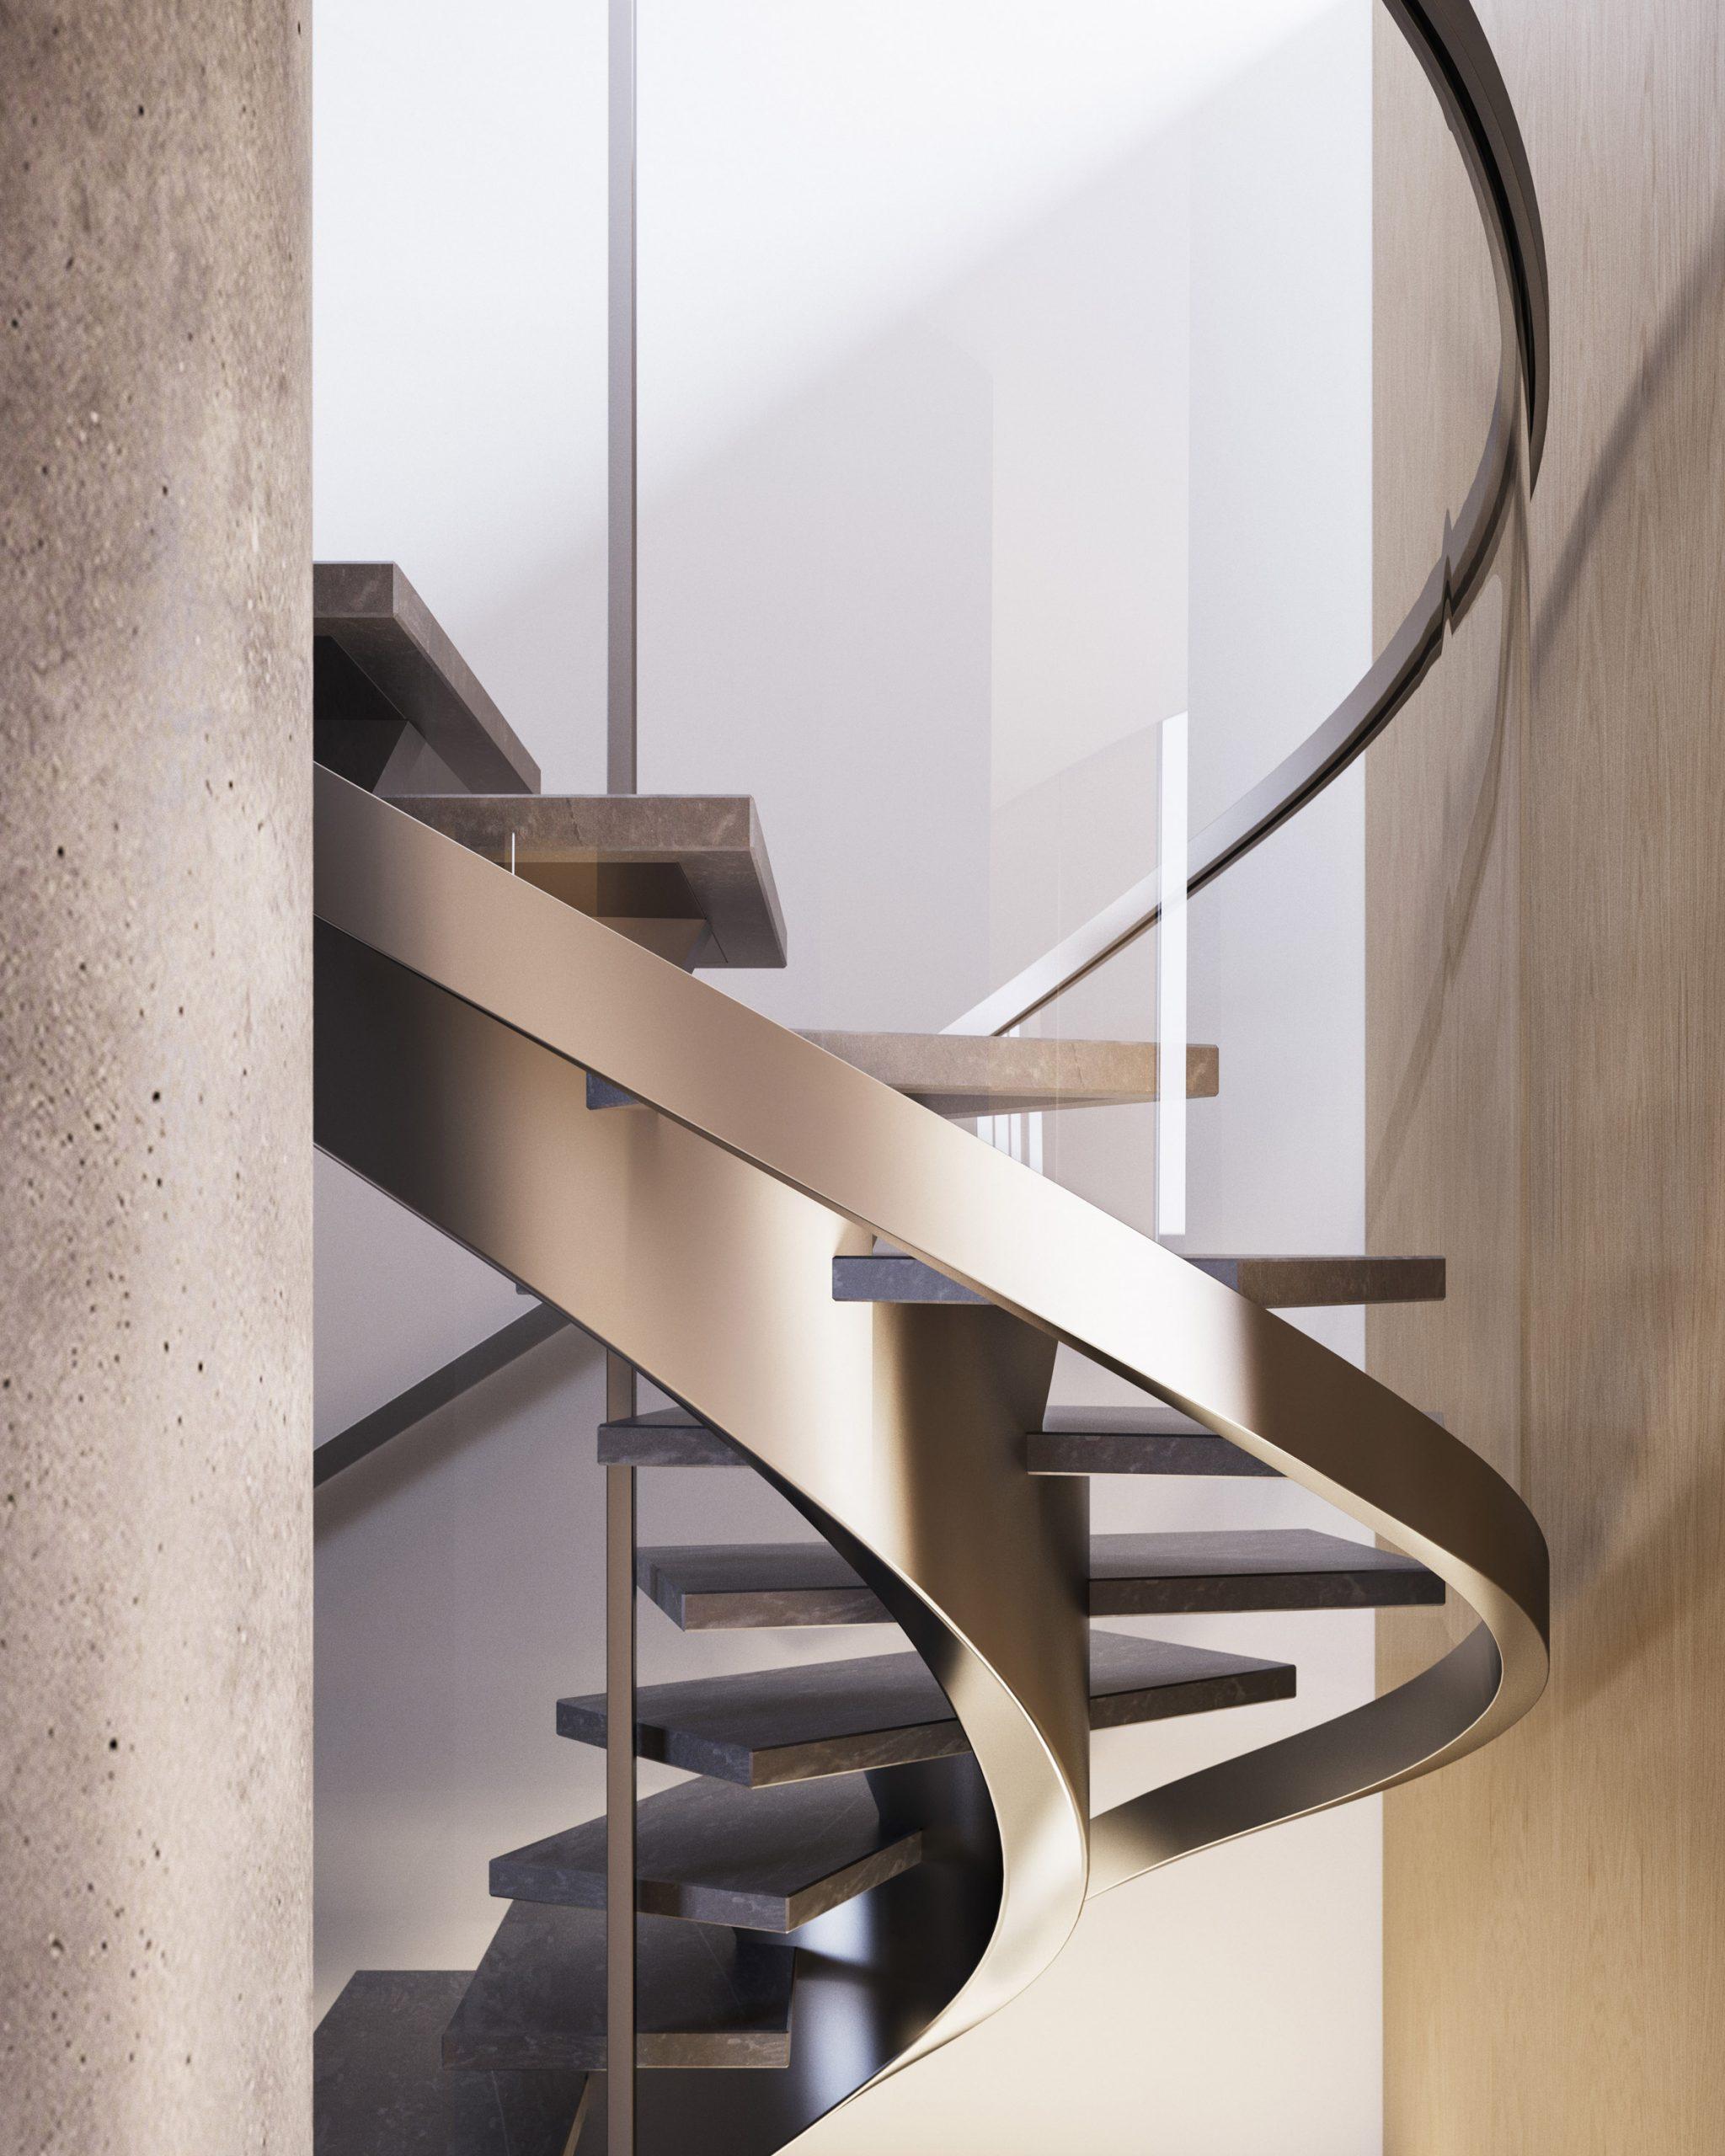 Thiết kế nội thất căn hộ Duplex 5